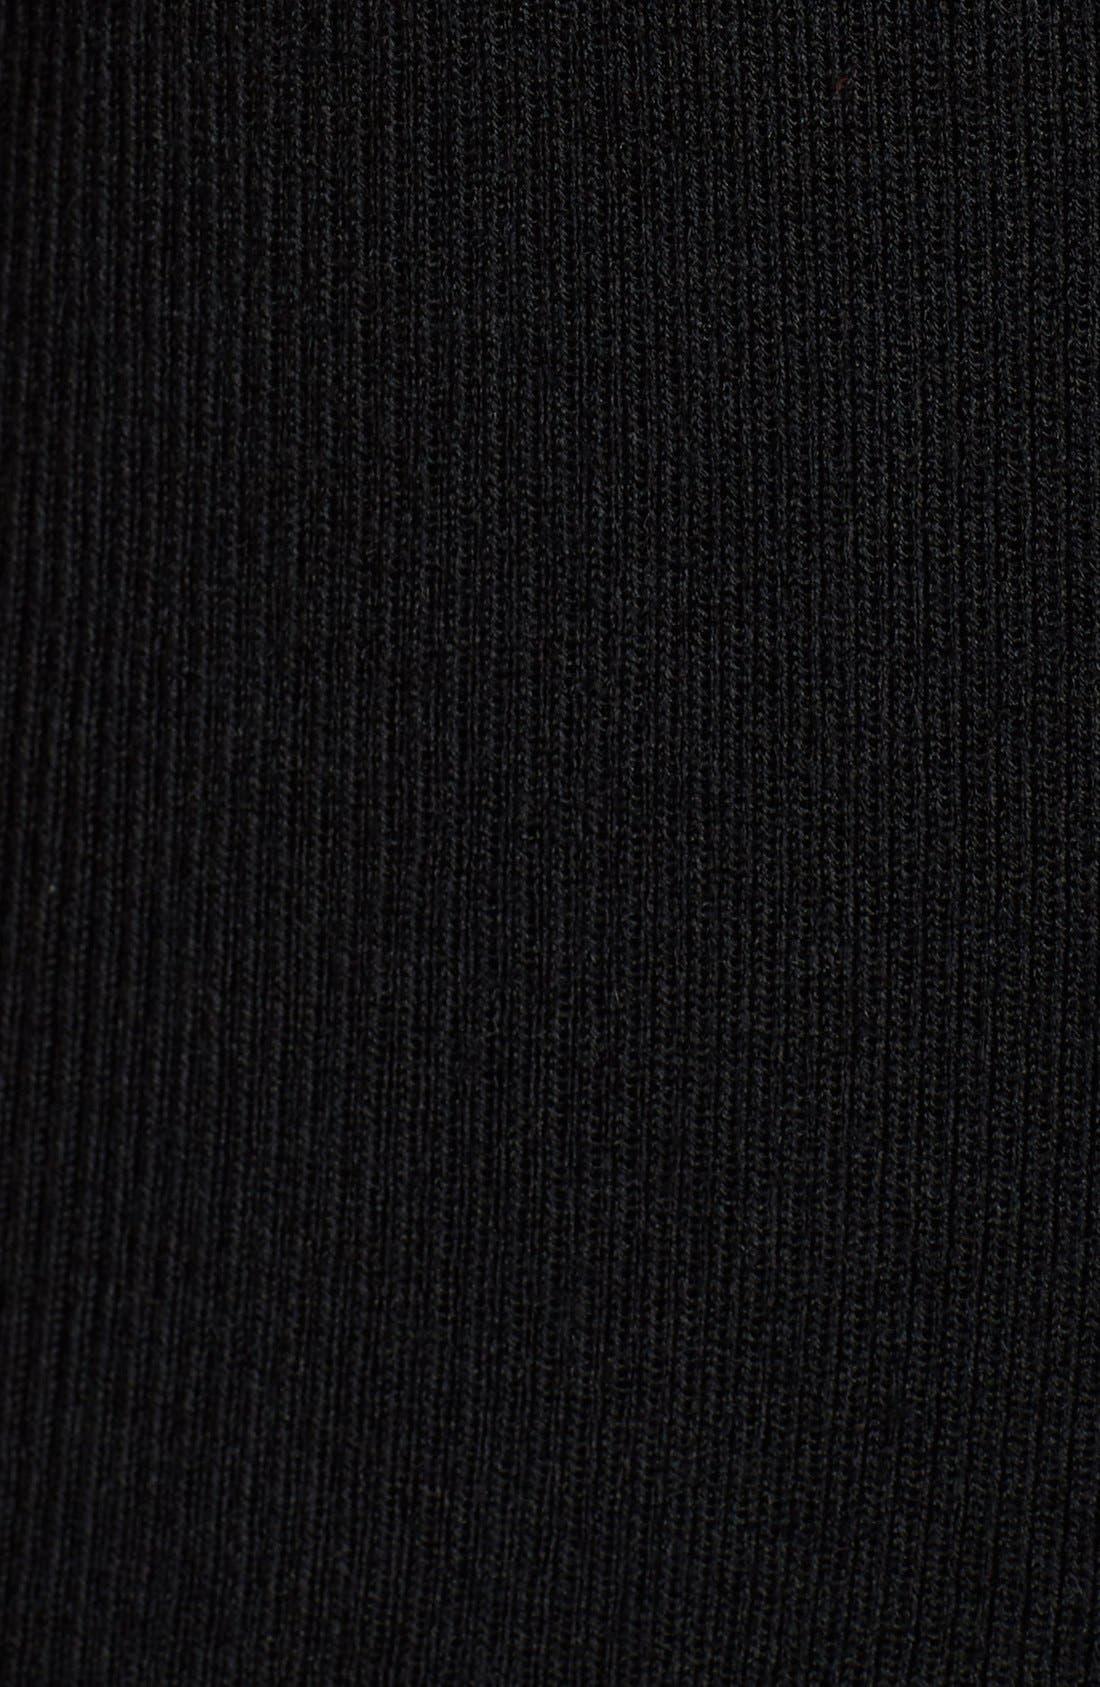 Rib Knit Wool Blend Cardigan,                             Alternate thumbnail 63, color,